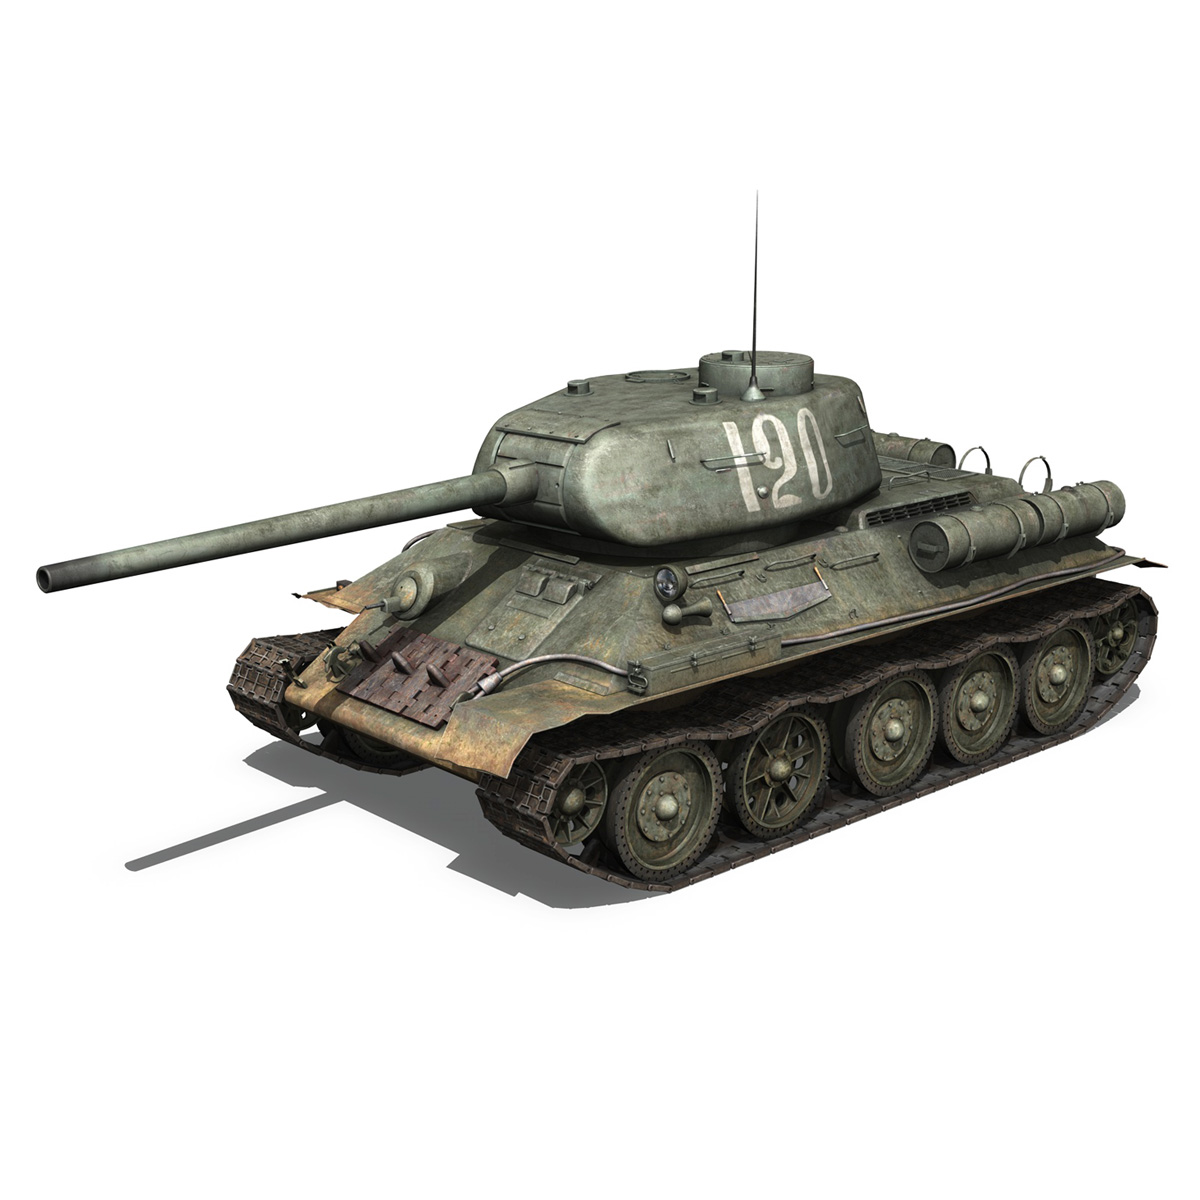 t-34 85 – soviet medium tank – 120 3d model 3ds fbx lwo lw lws obj c4d 265370